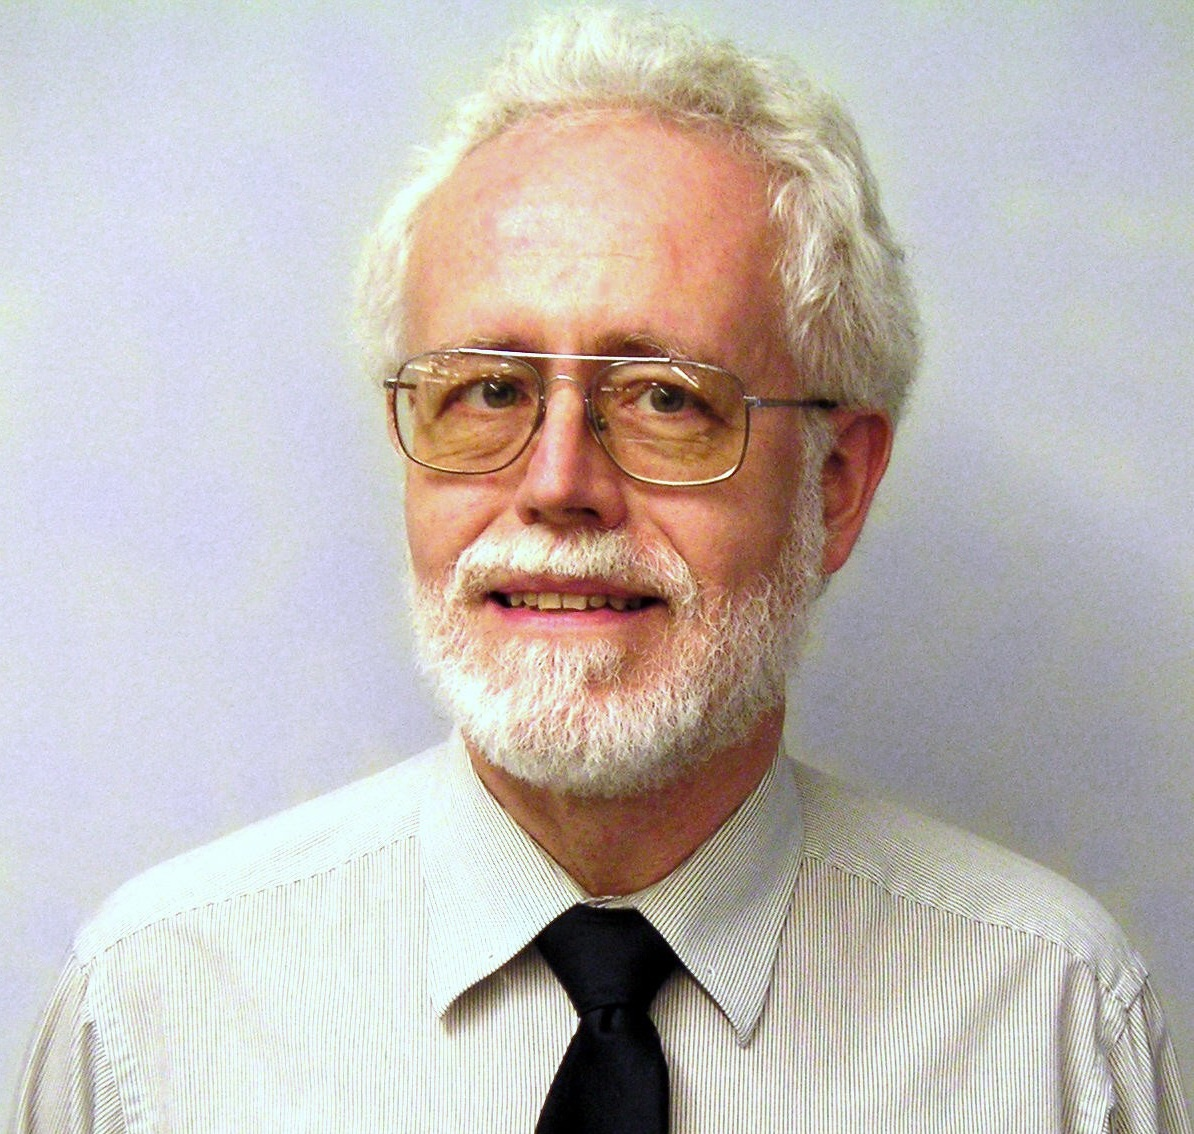 WLS Engineer Tim Wright